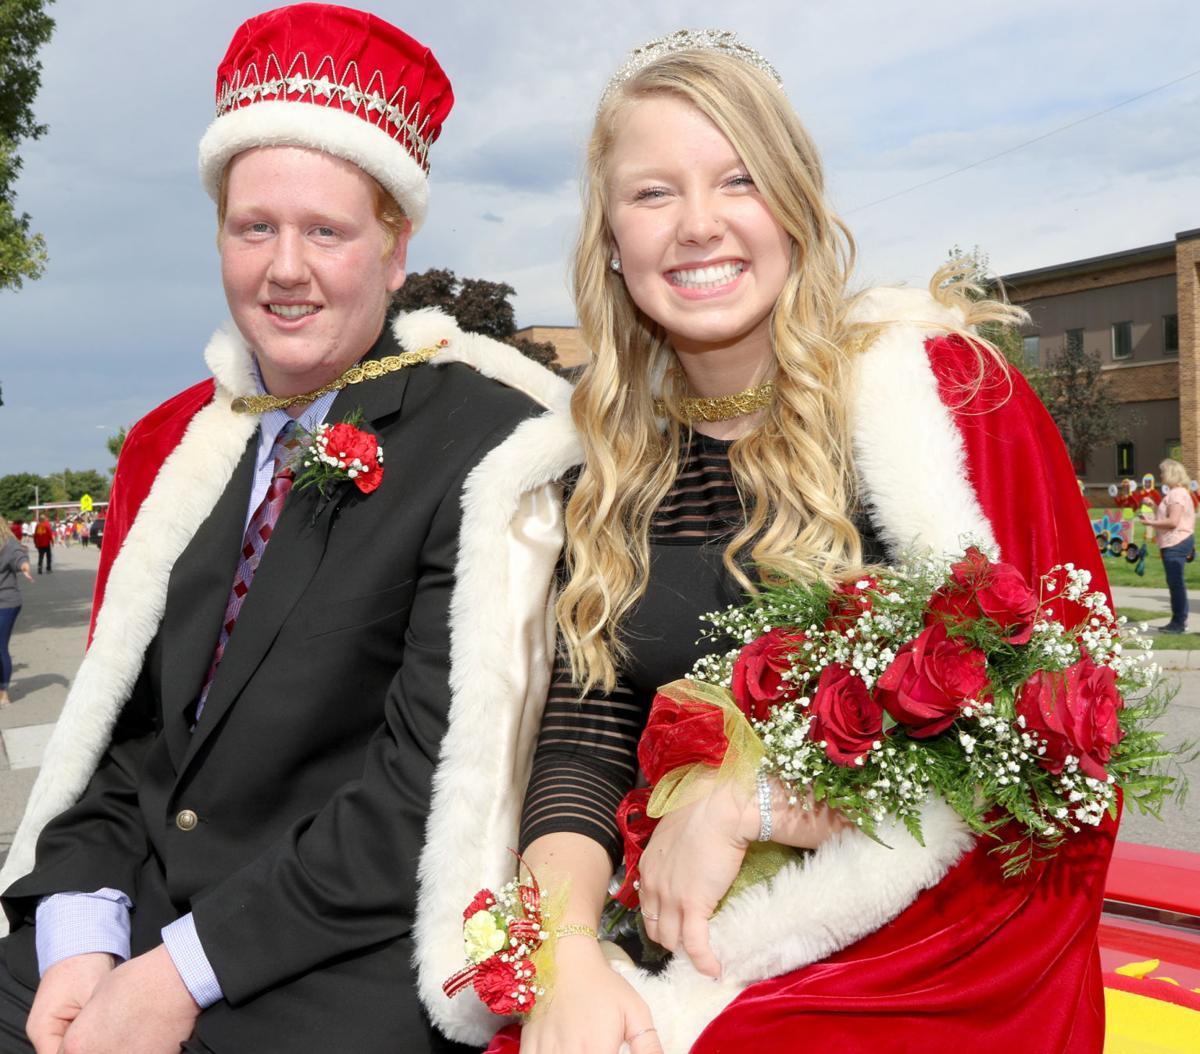 kuemper homecoming royalty5 19-09-27.jpg